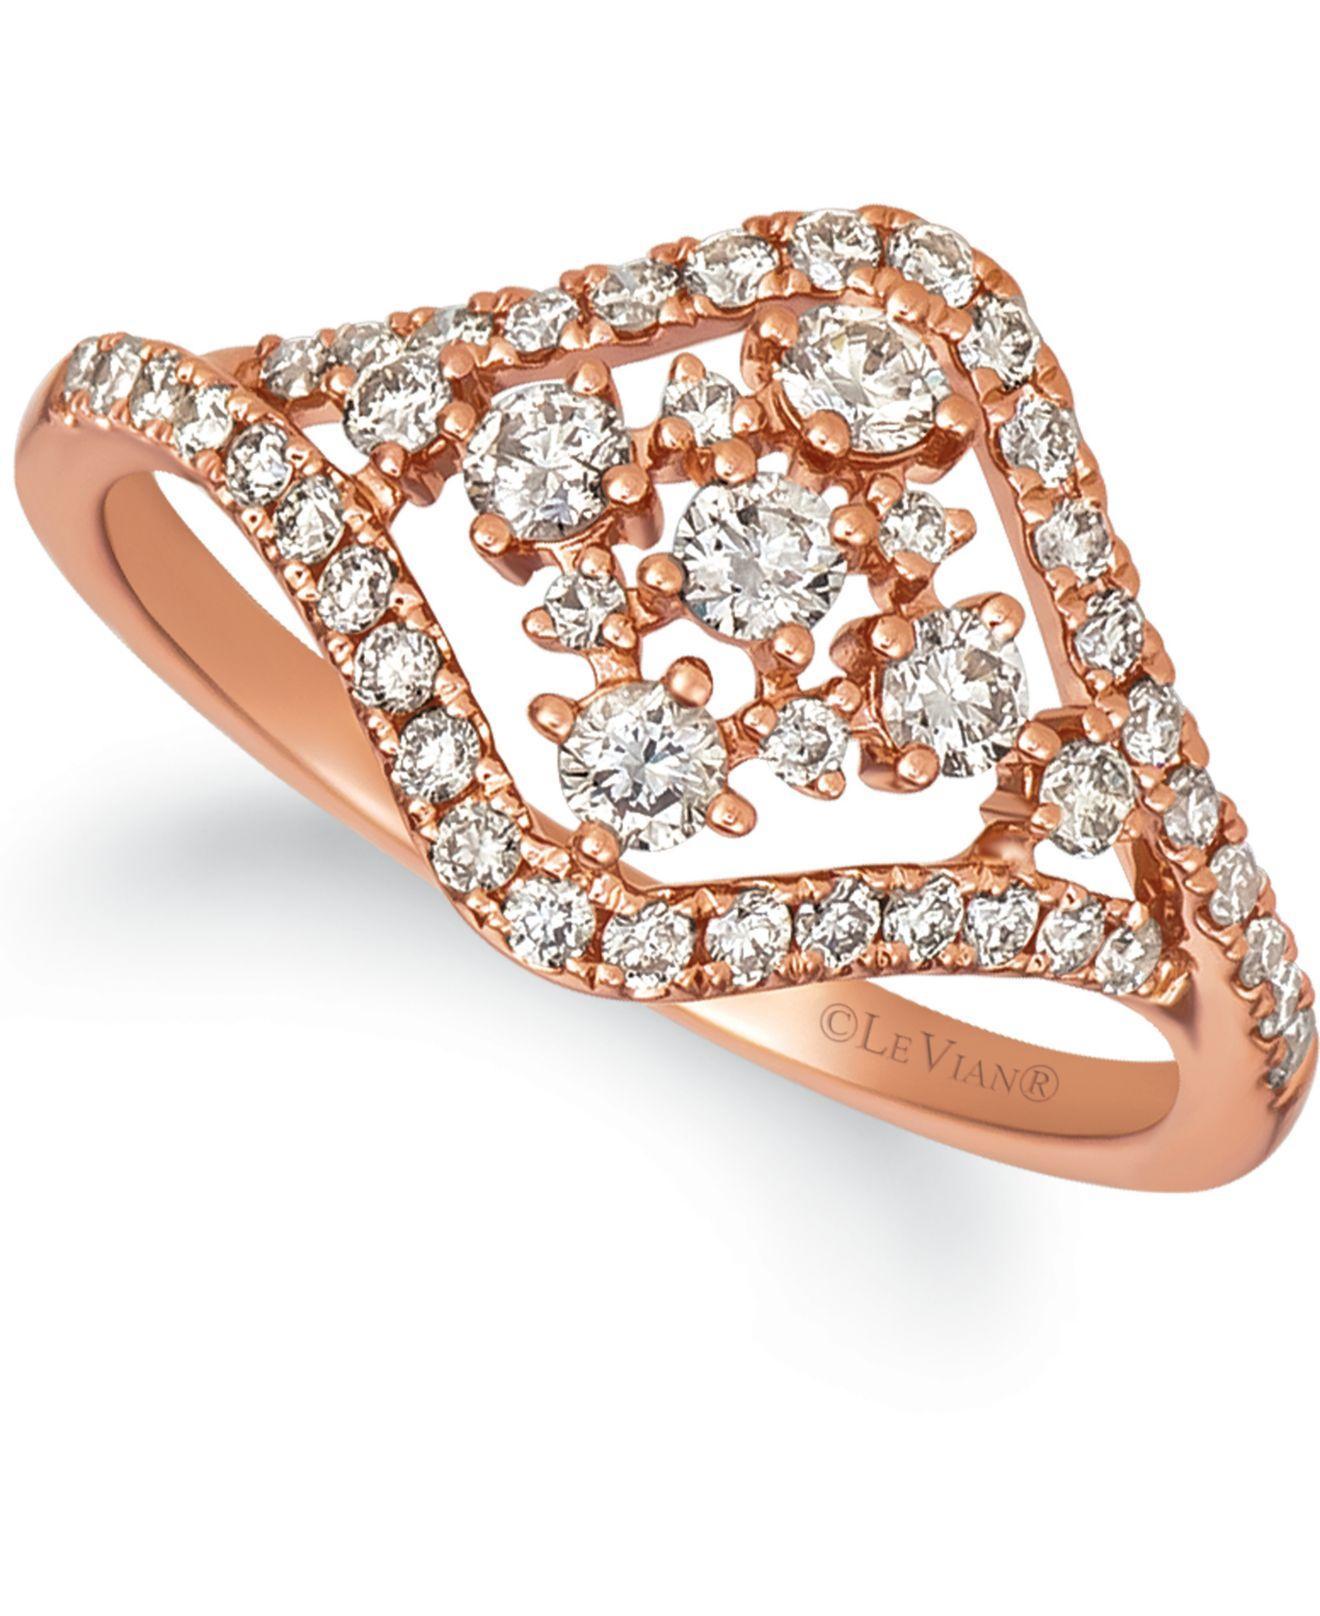 Le Vian Nude Diamond Ring 1/2 ct tw Round 14K Strawberry